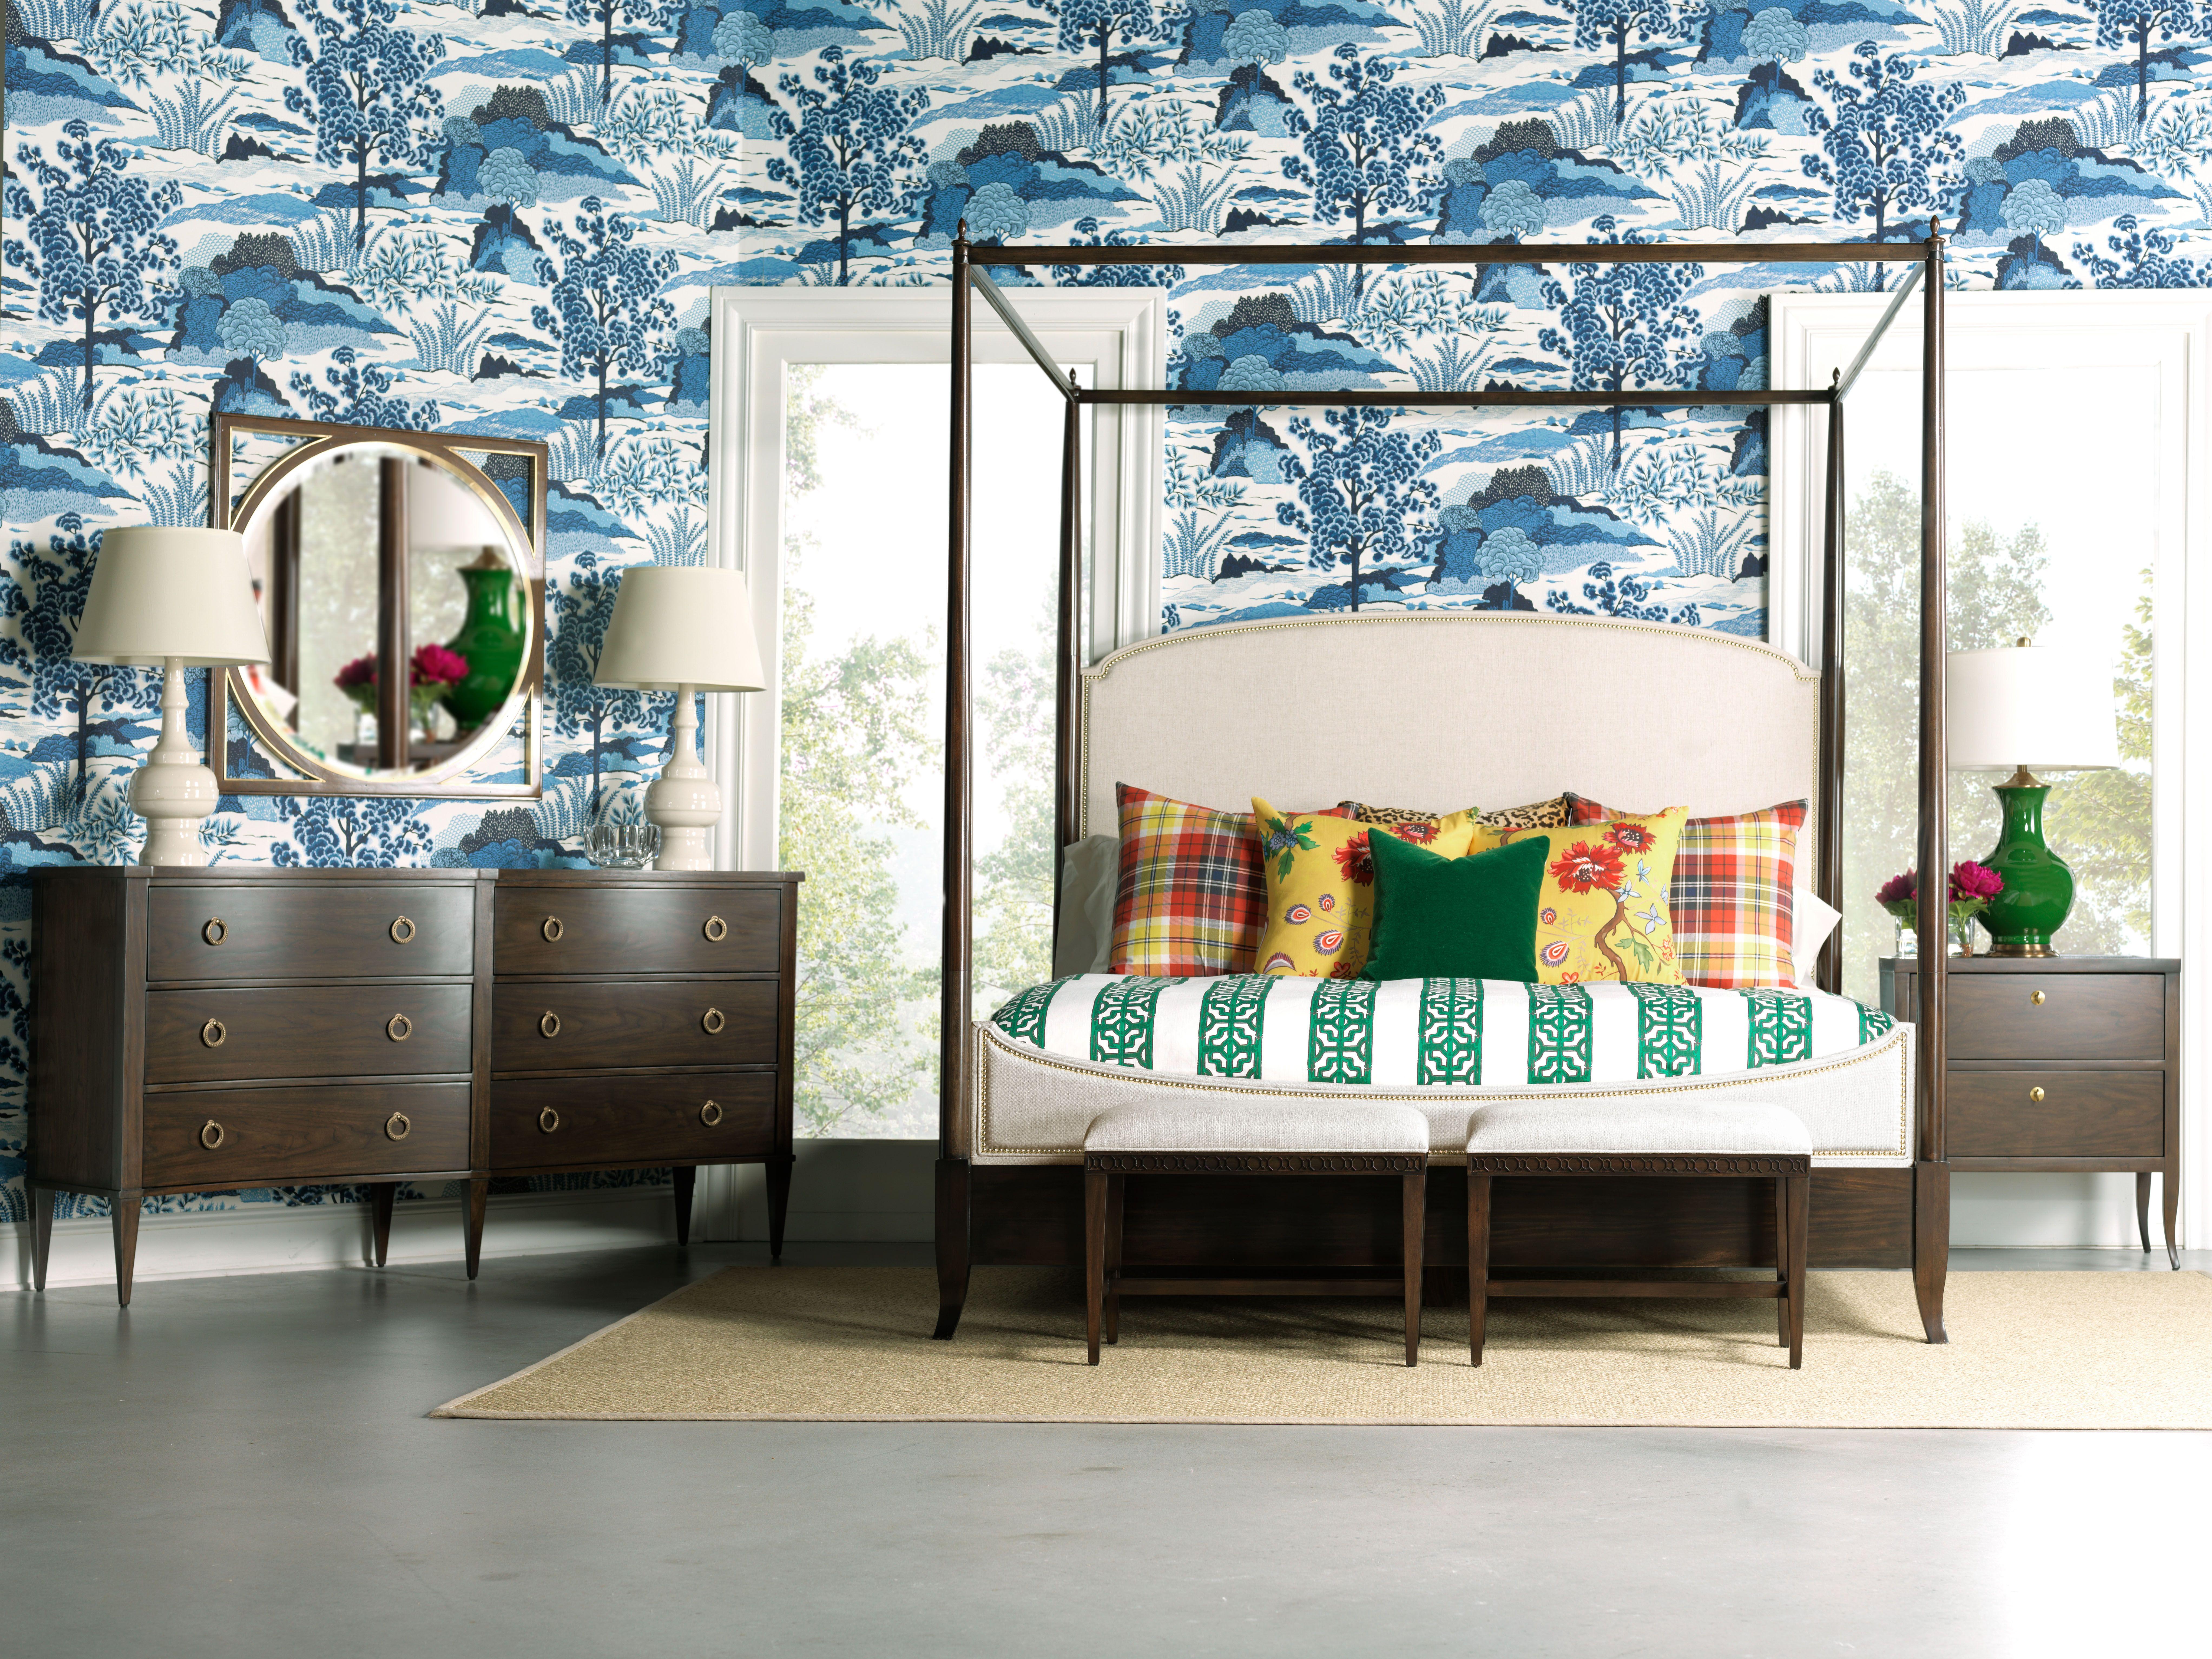 Carrington Bed By Tobi Fairley For Woodbridge Bedroom Inspirations Woodbridge Furniture Wood Bridge